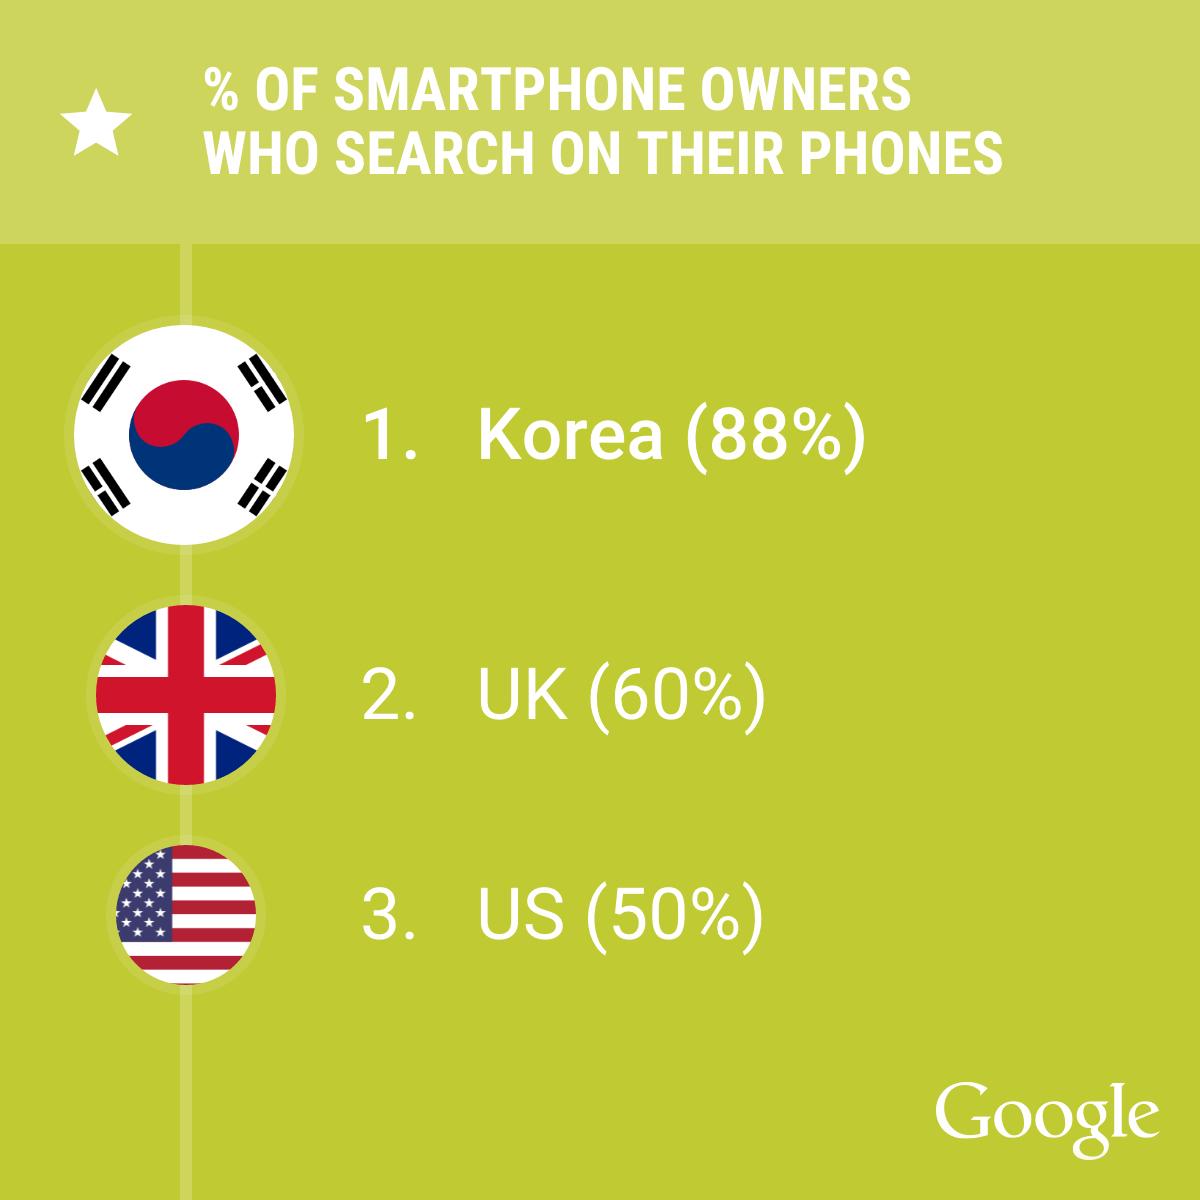 google-infographic (11).jpg